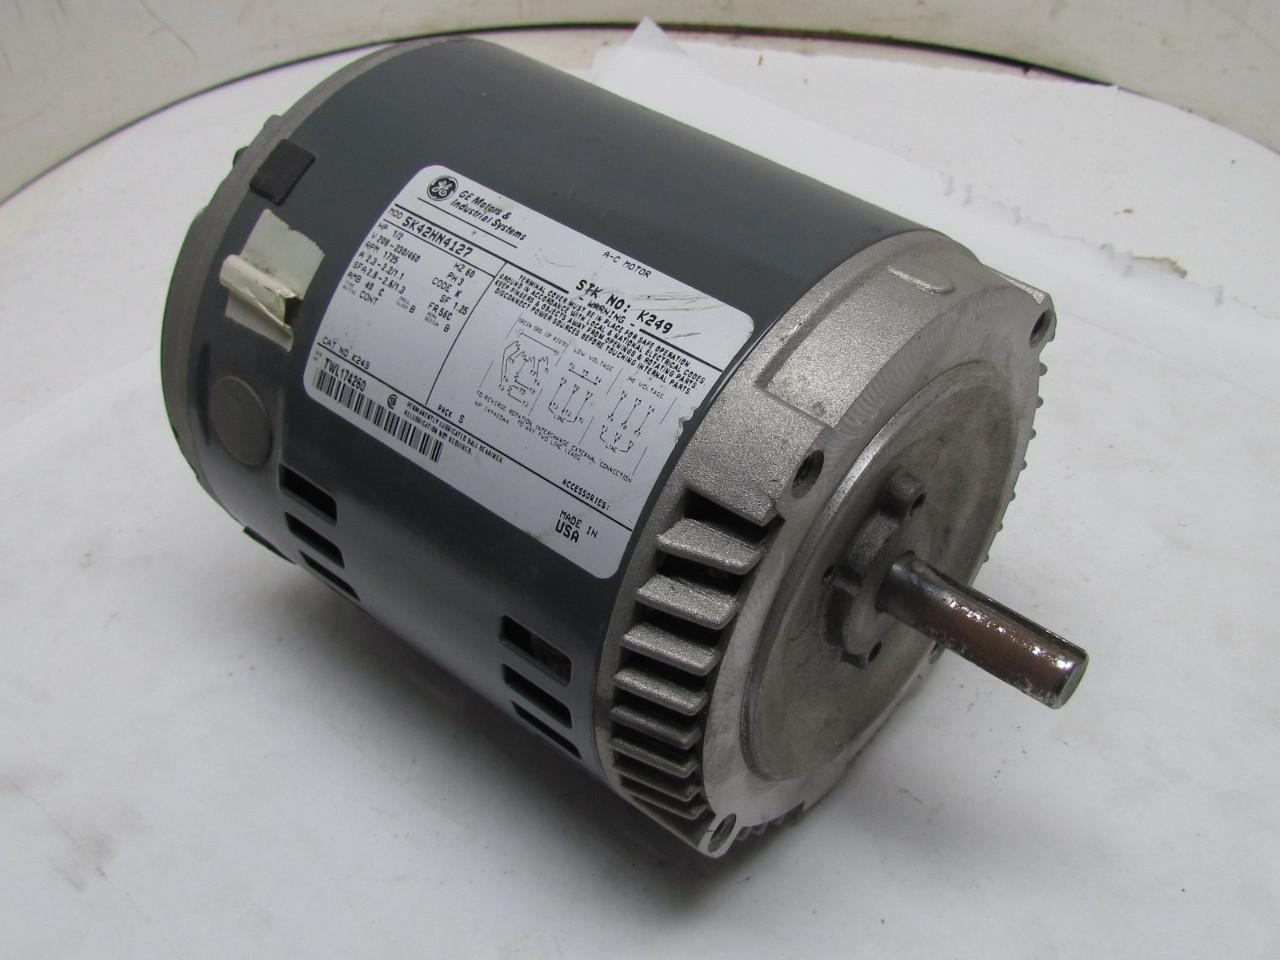 General electric 5k42hn4127 3ph ac motor 1 2hp 1725 rpm for 1 2 hp electric motor 1725 rpm